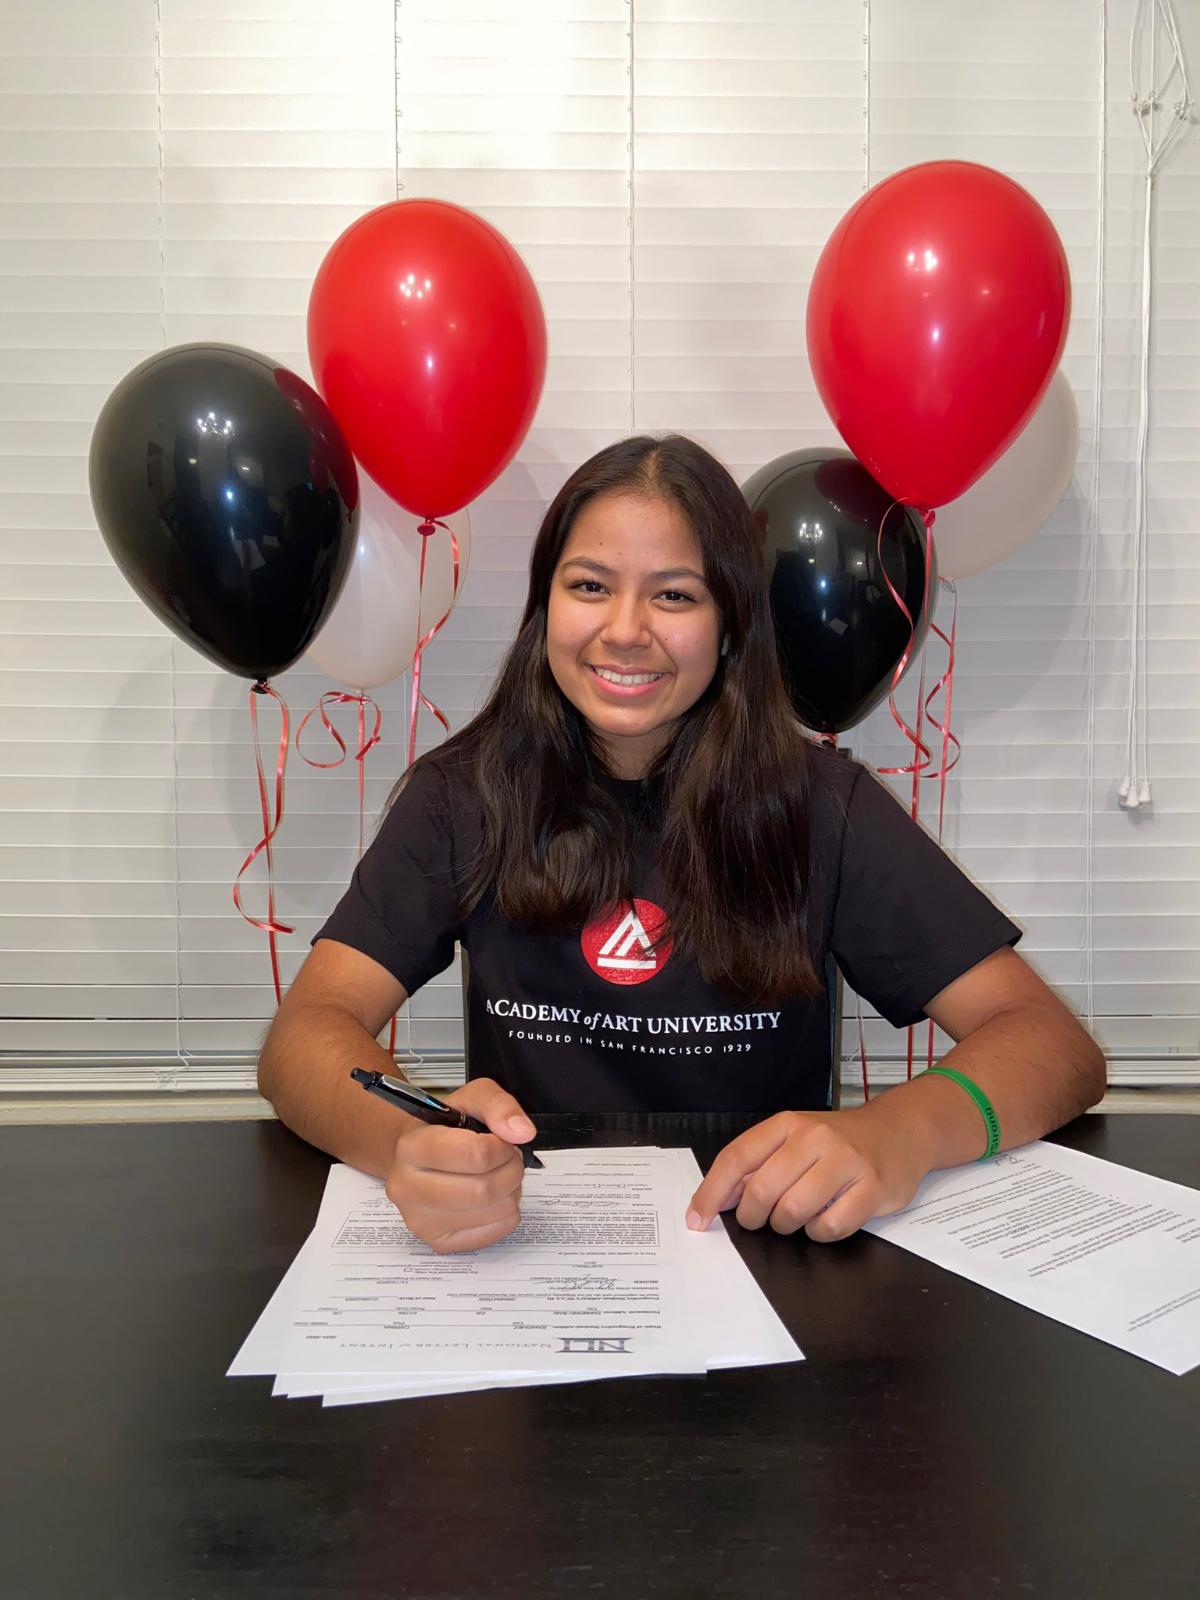 Carina Sanchez Will Play For Academy of Art University